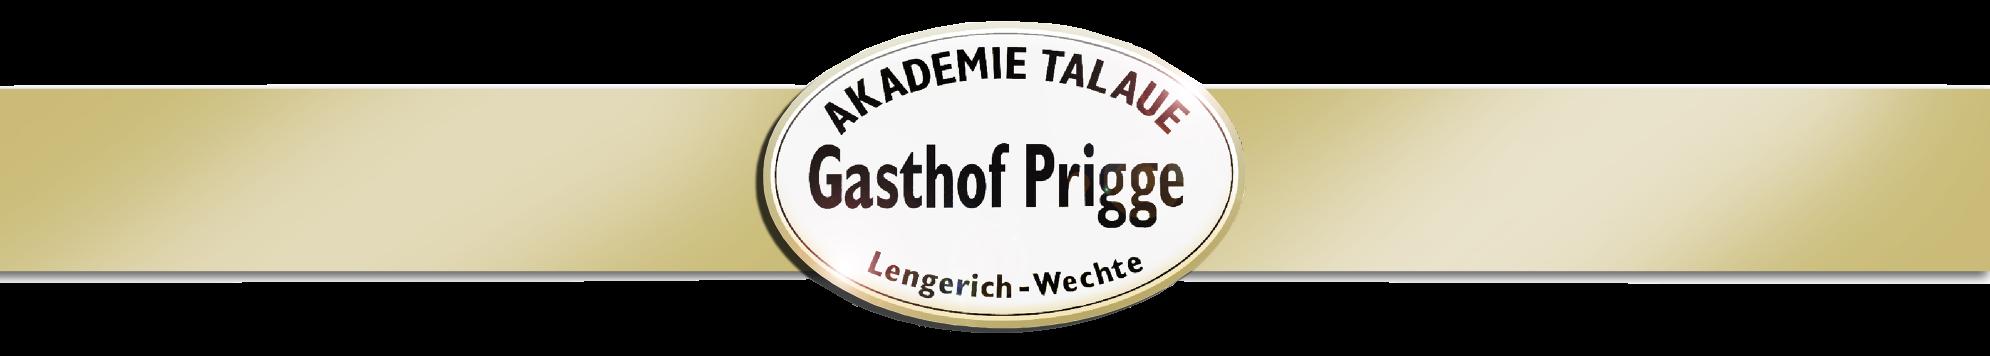 Gasthof-Prigge